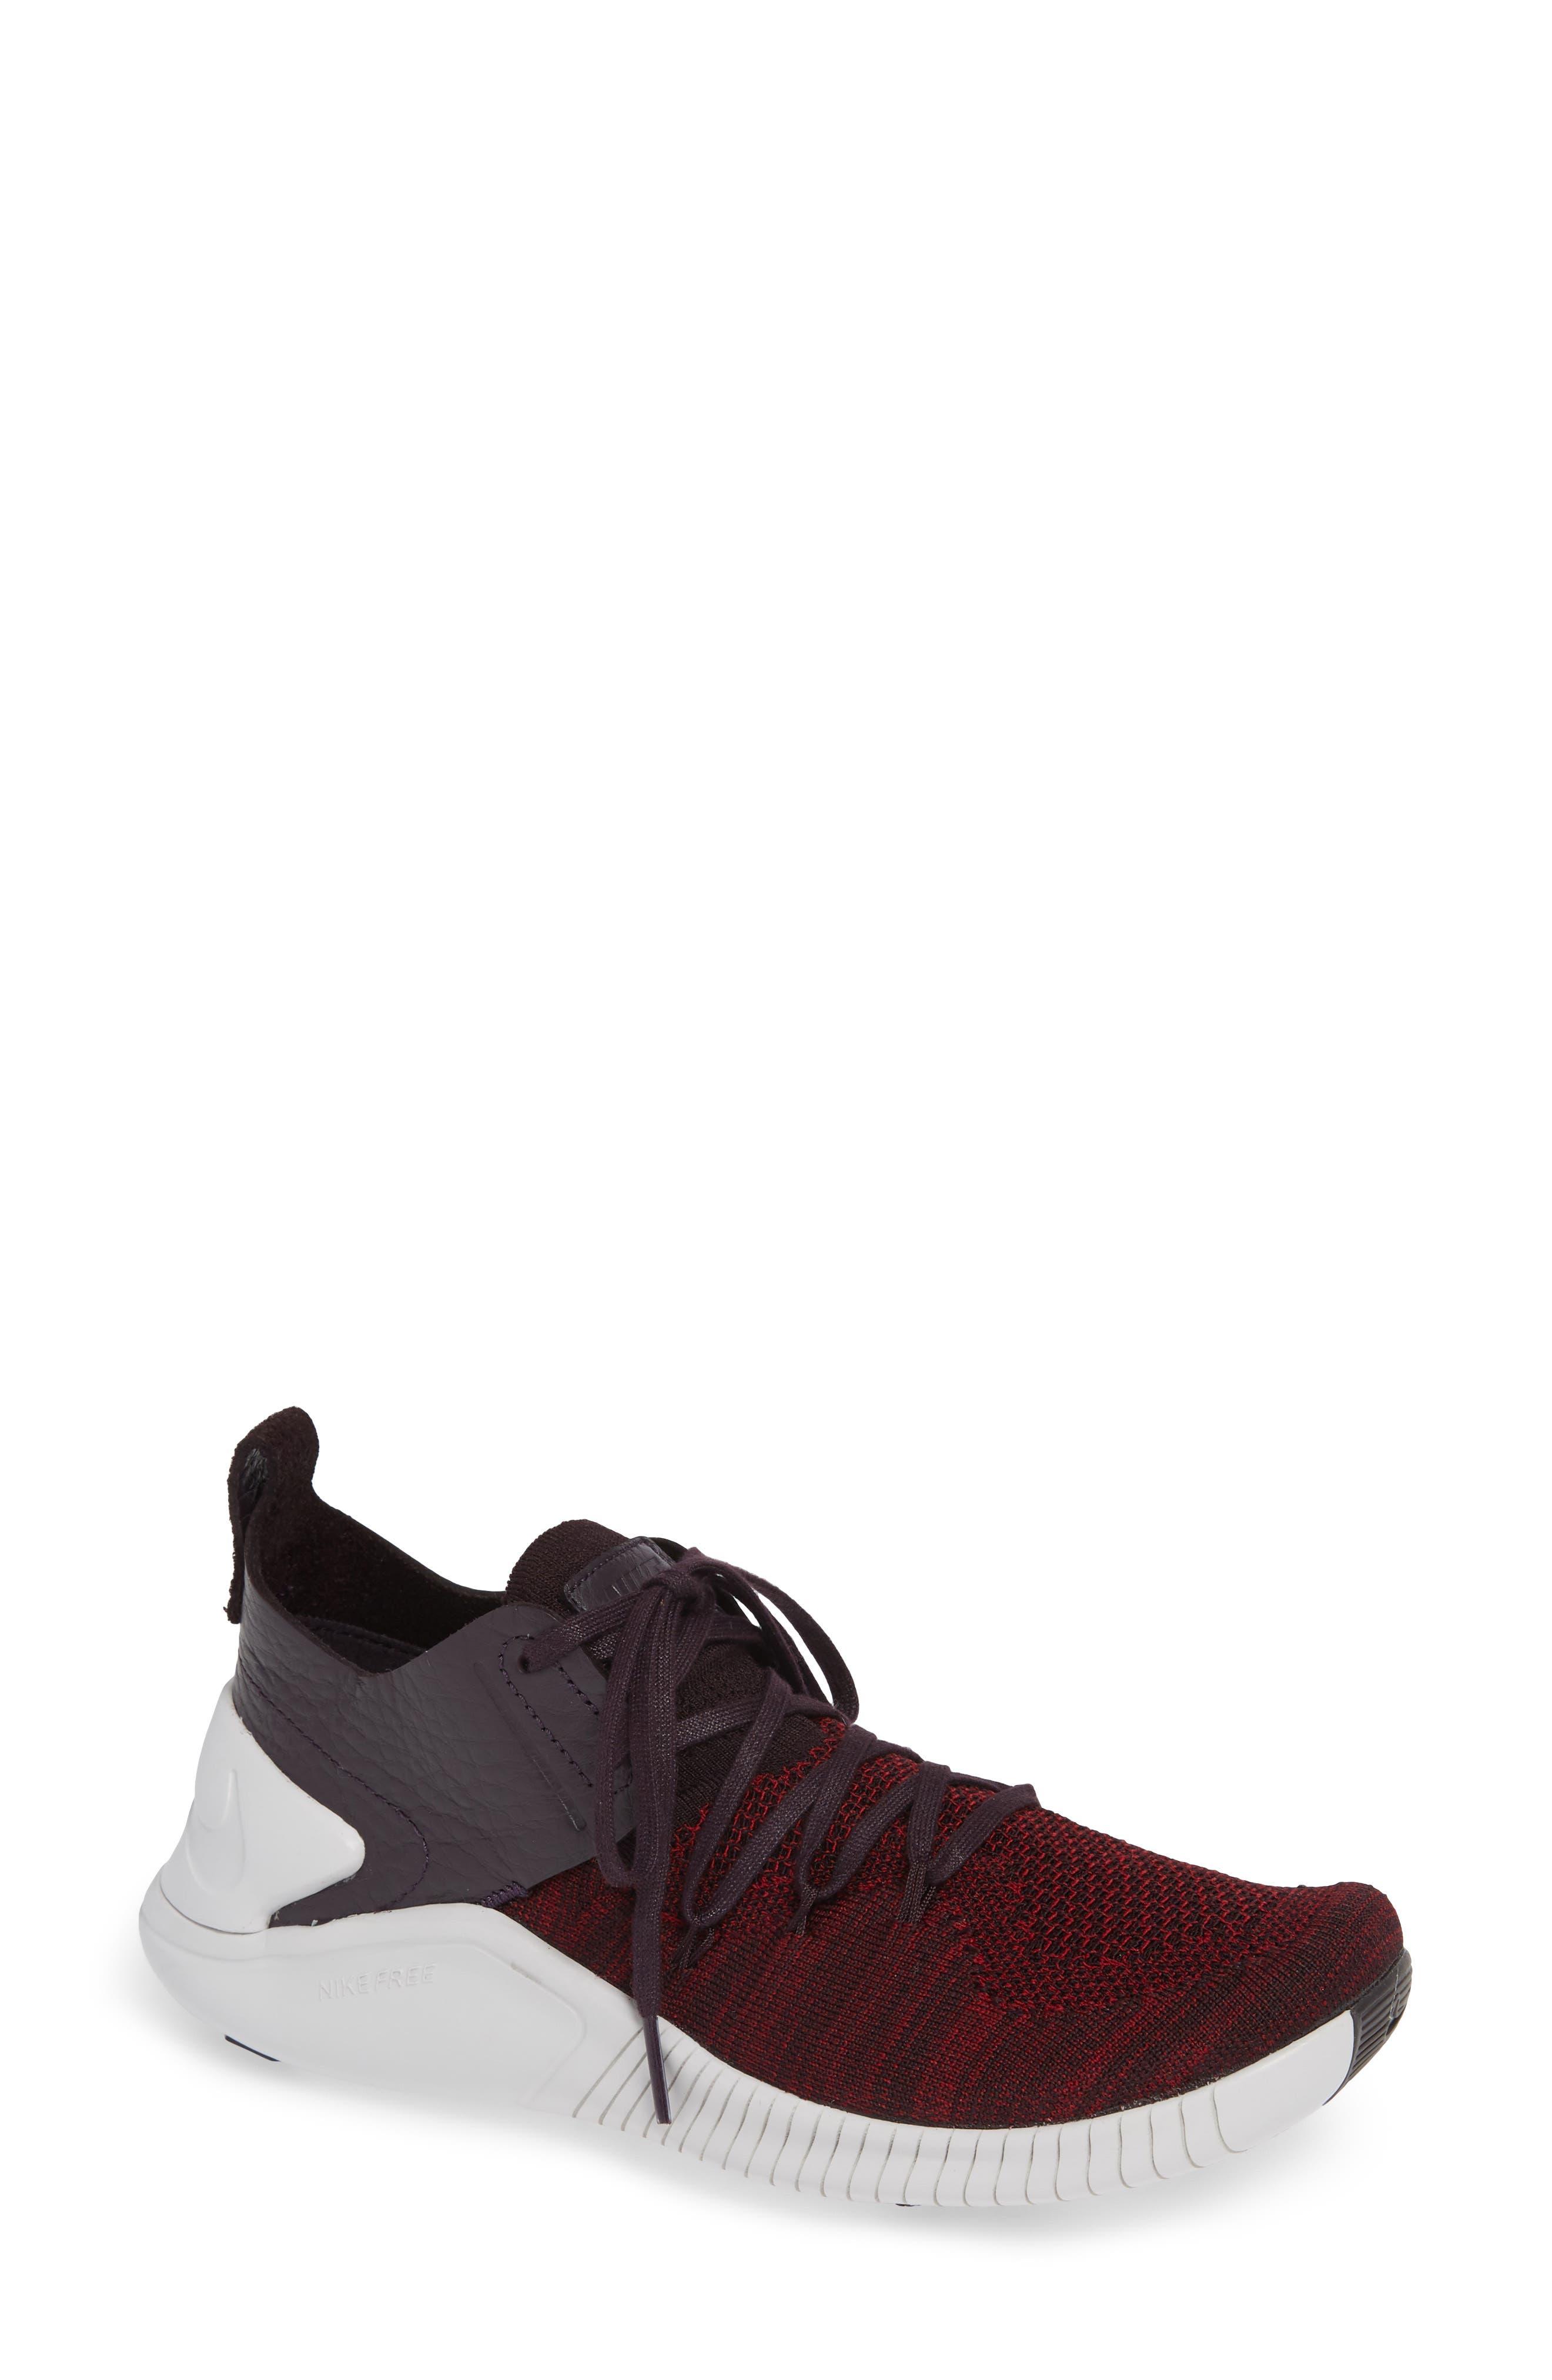 Free TR Flyknit 3 Training Shoe,                         Main,                         color, BURGUNDY ASH/ VAST GREY